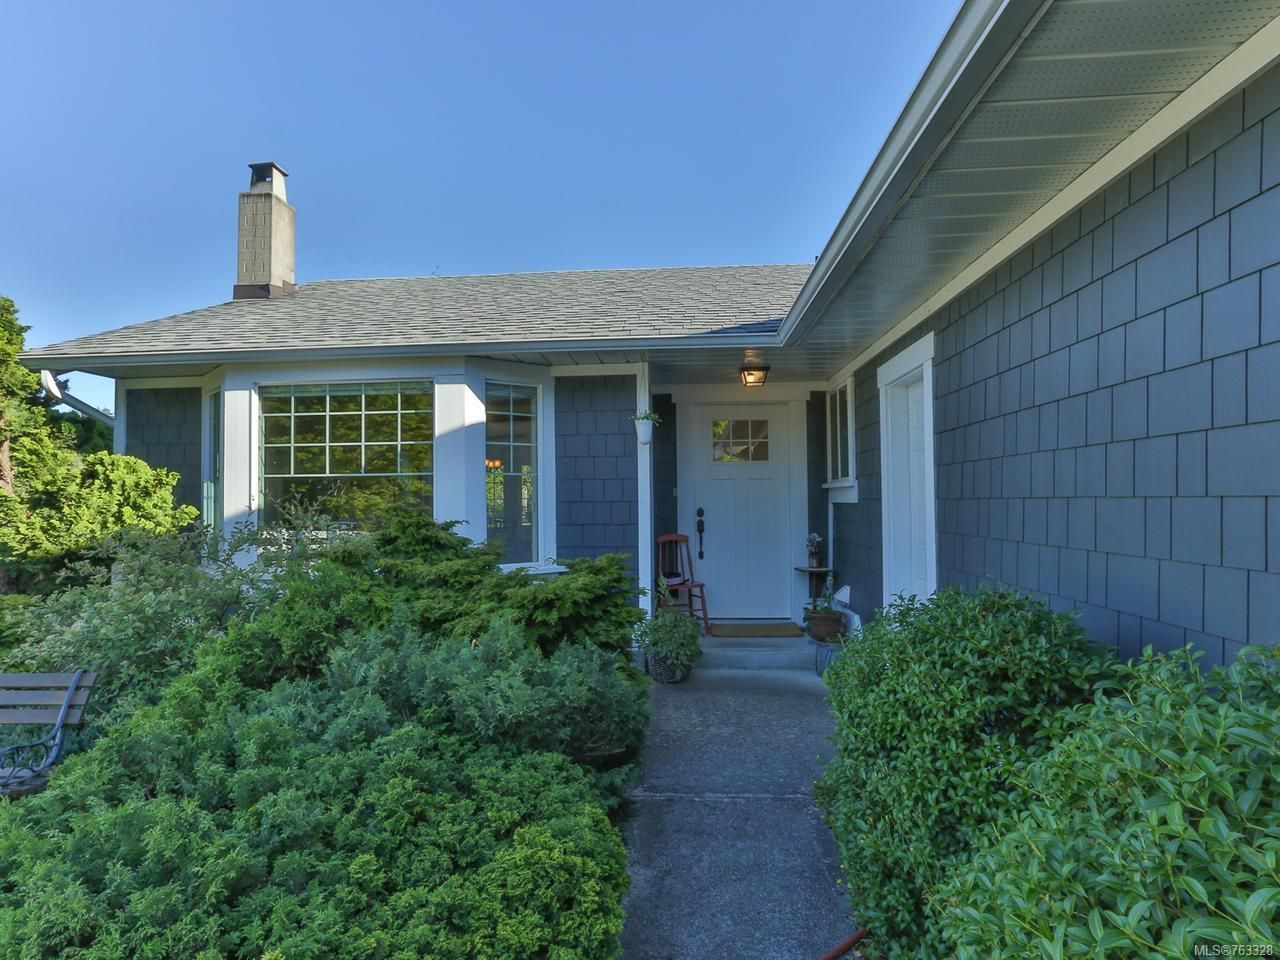 Main Photo: 504 W First Ave in QUALICUM BEACH: PQ Qualicum Beach House for sale (Parksville/Qualicum)  : MLS®# 763328